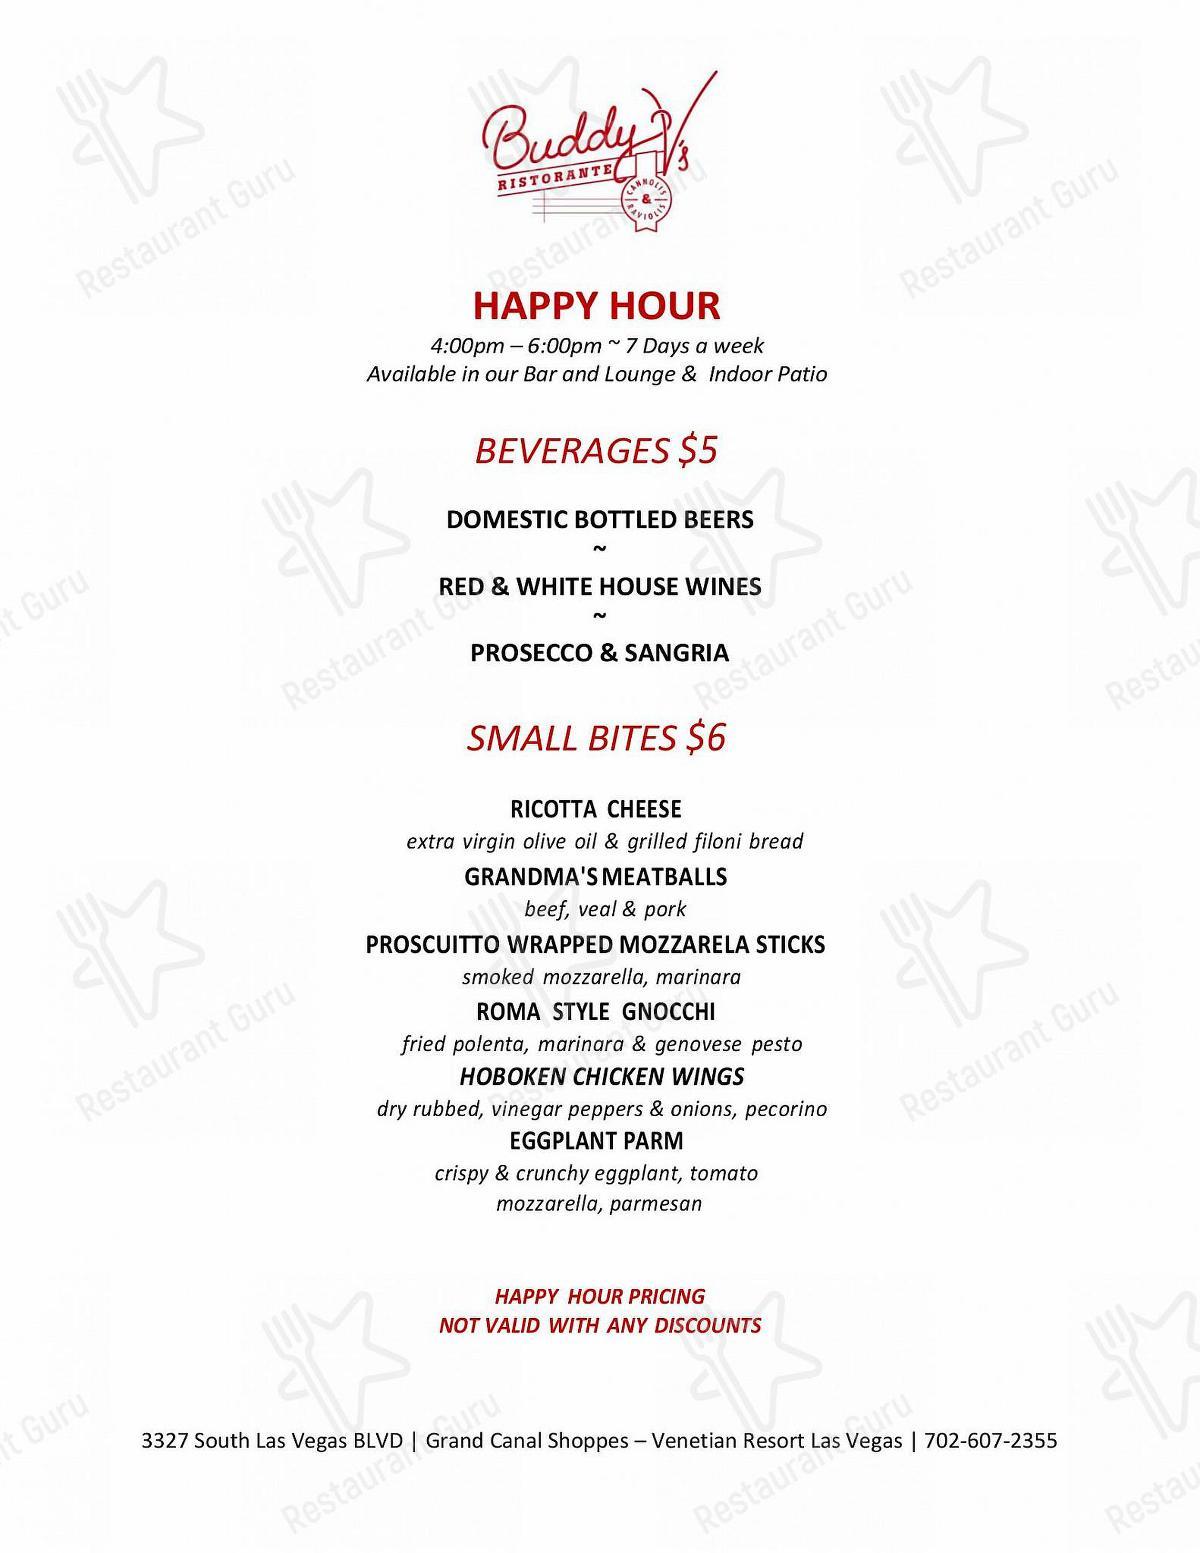 Carta de Buddy V's Ristorante - comidas y bebidas